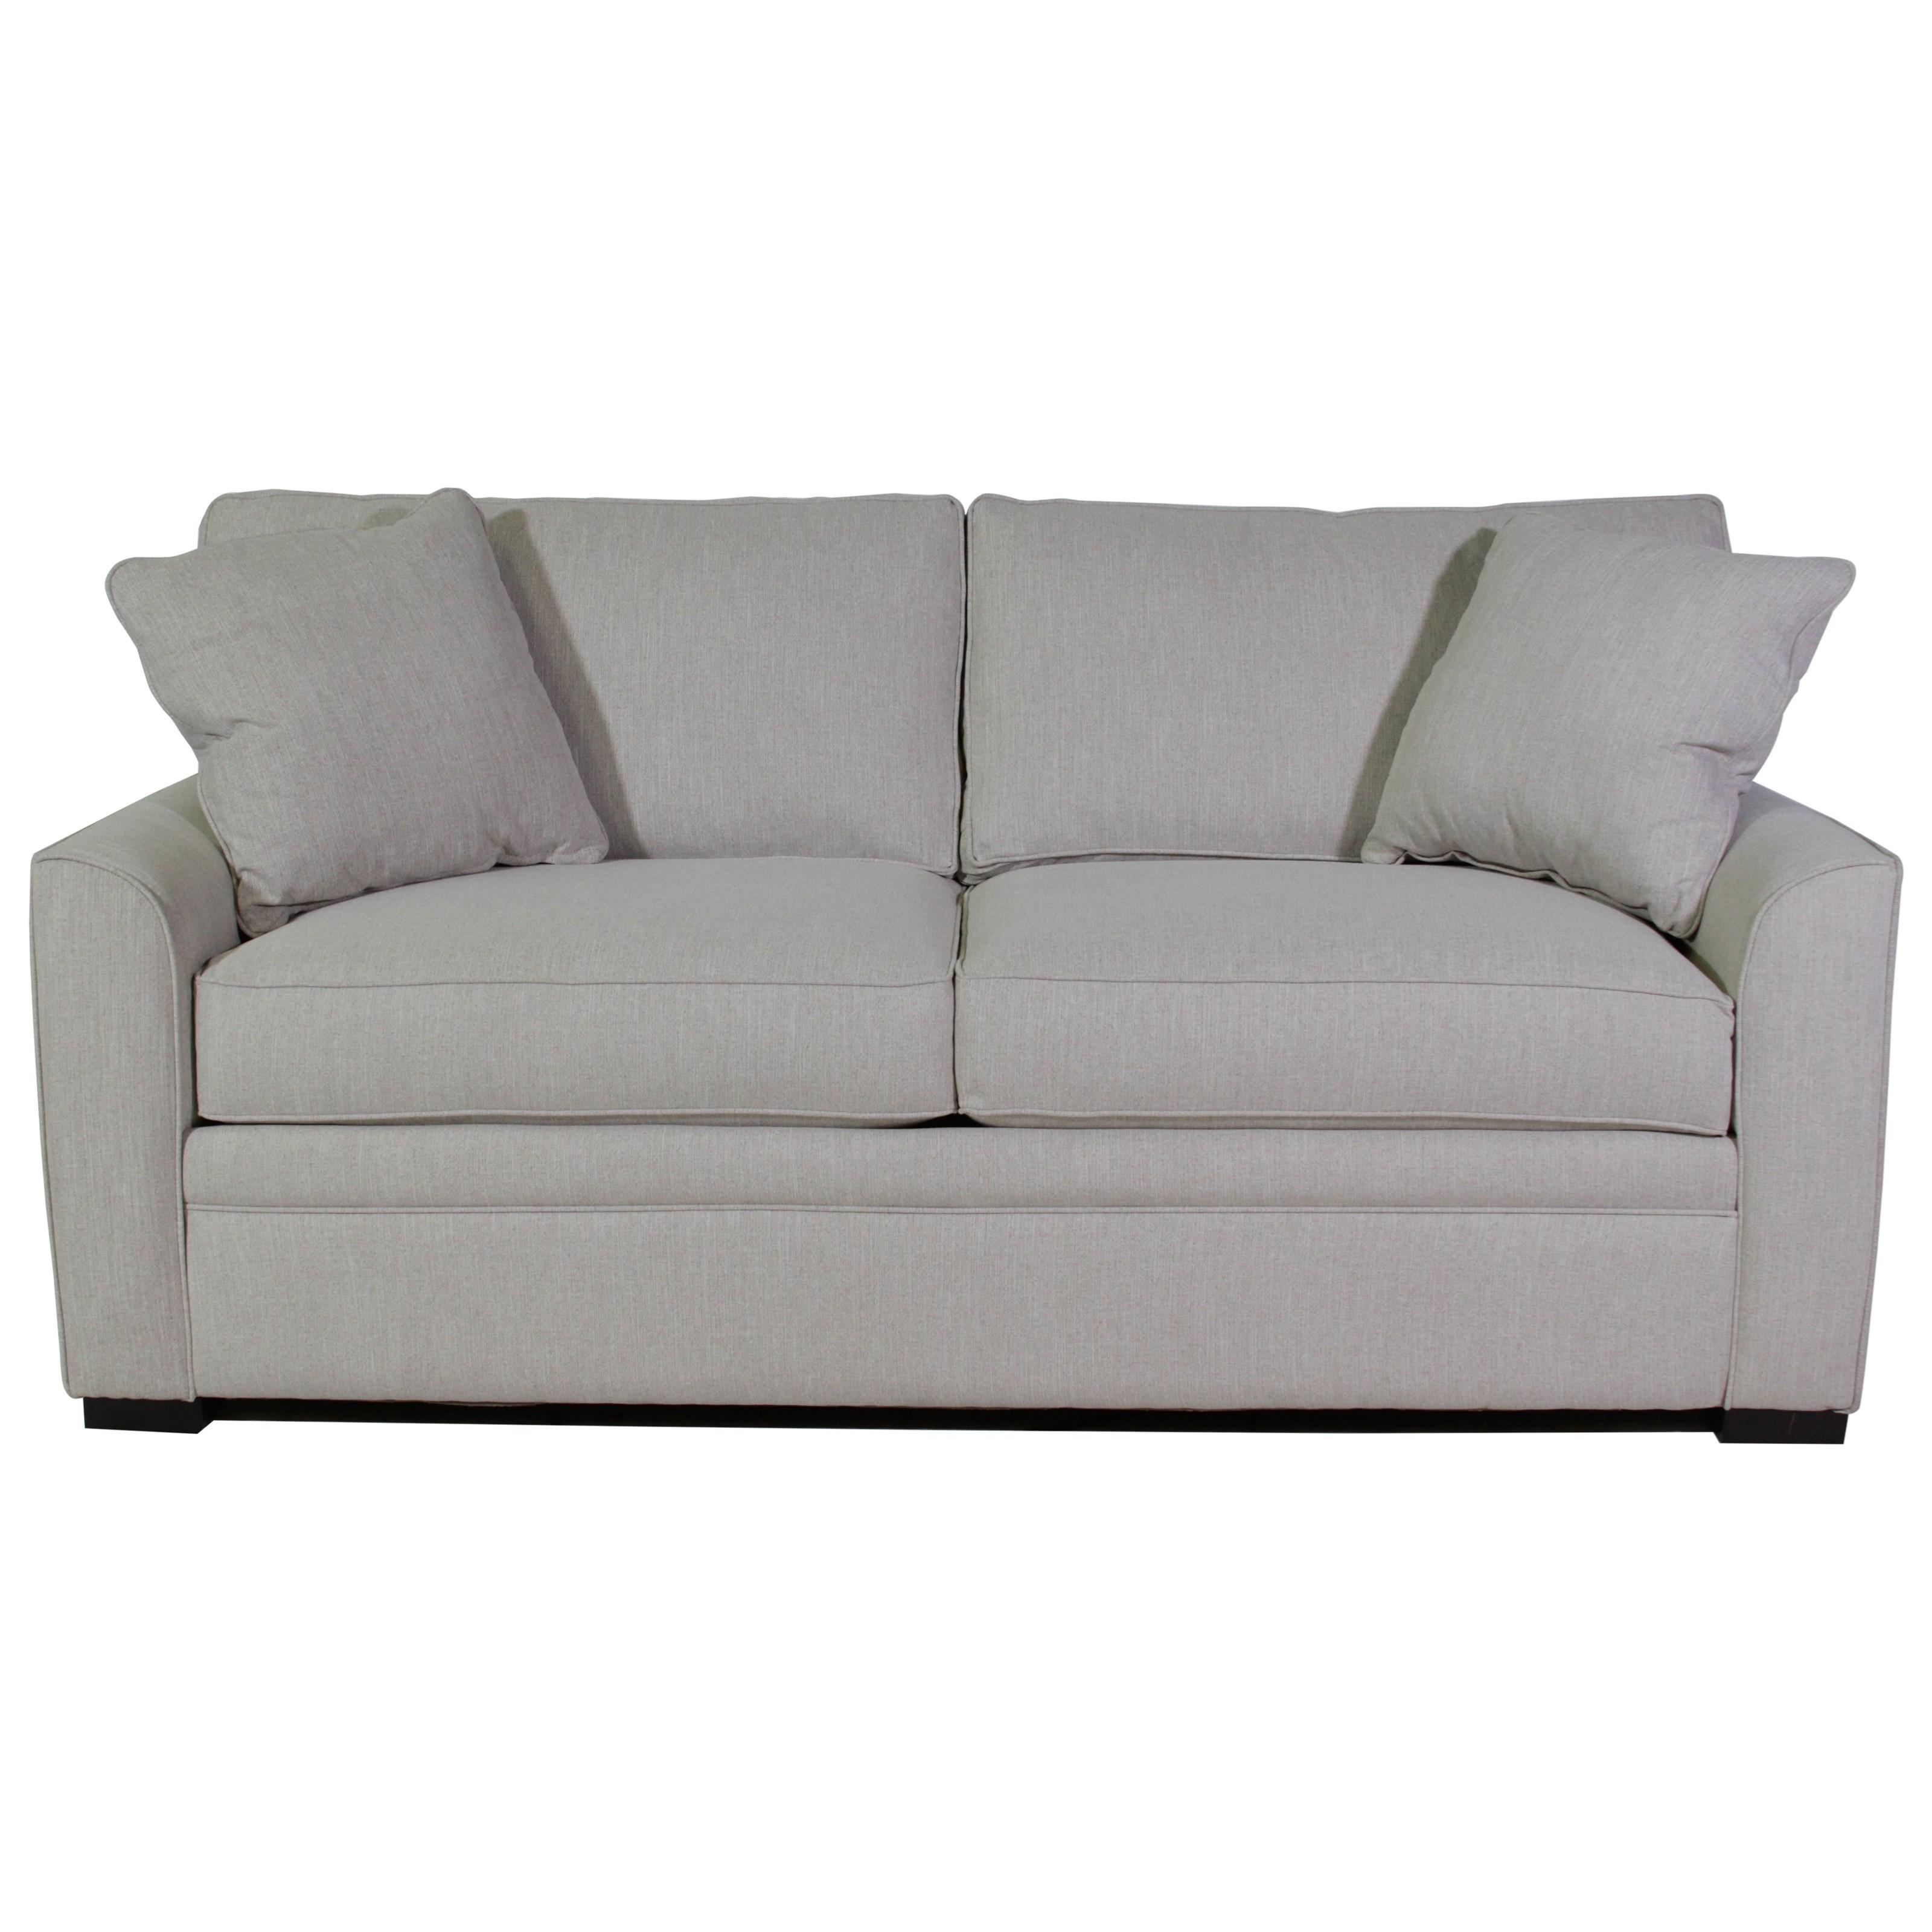 Jonathan Louis BlissfulFull Sofa Sleeper ...